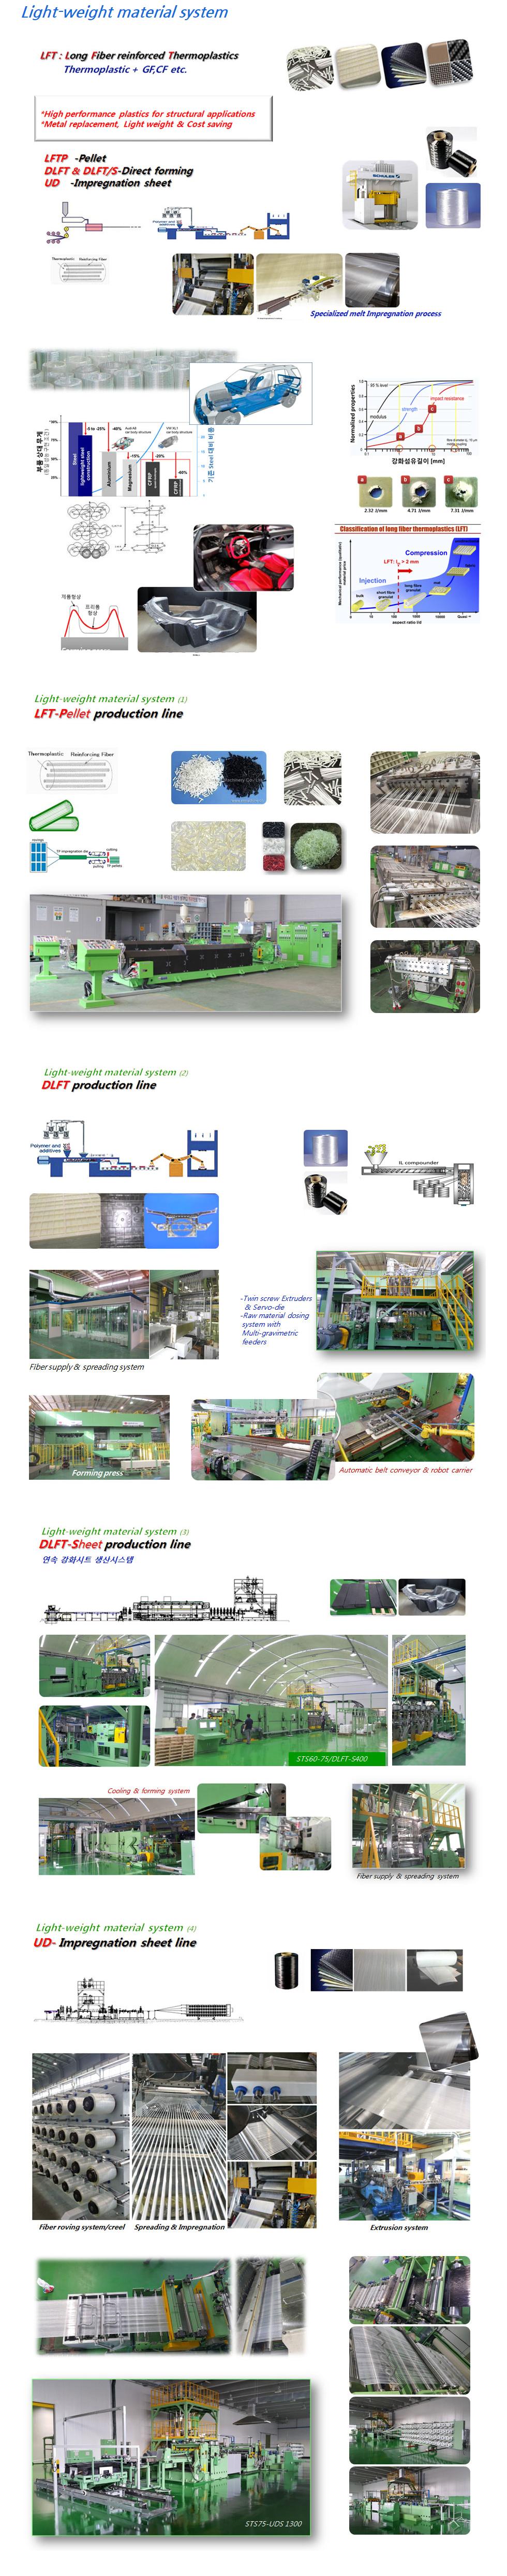 HANKOOK E.M Light-weight Material System